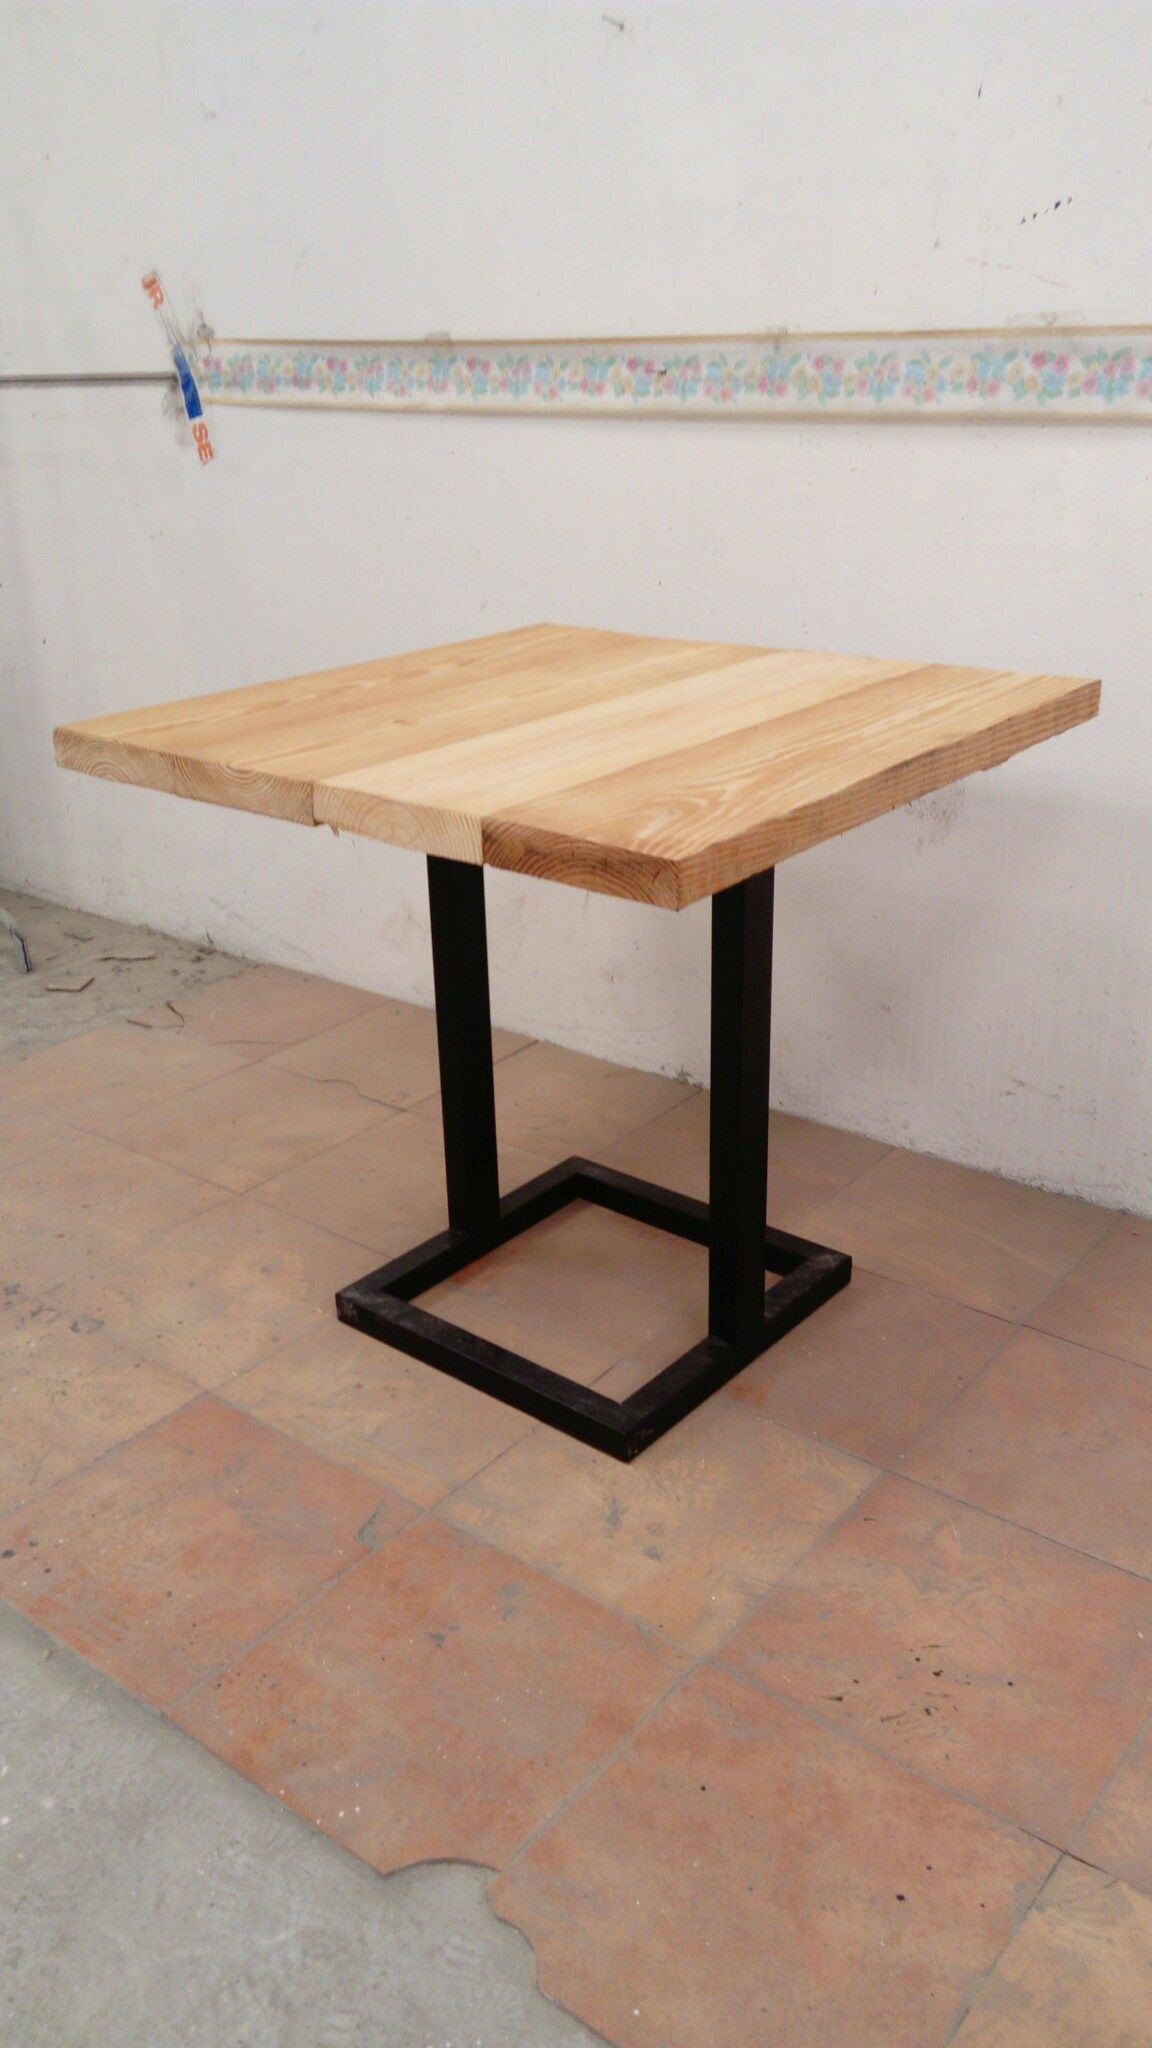 Mesa de madera y forja medidas 80x80 x75cm para bar